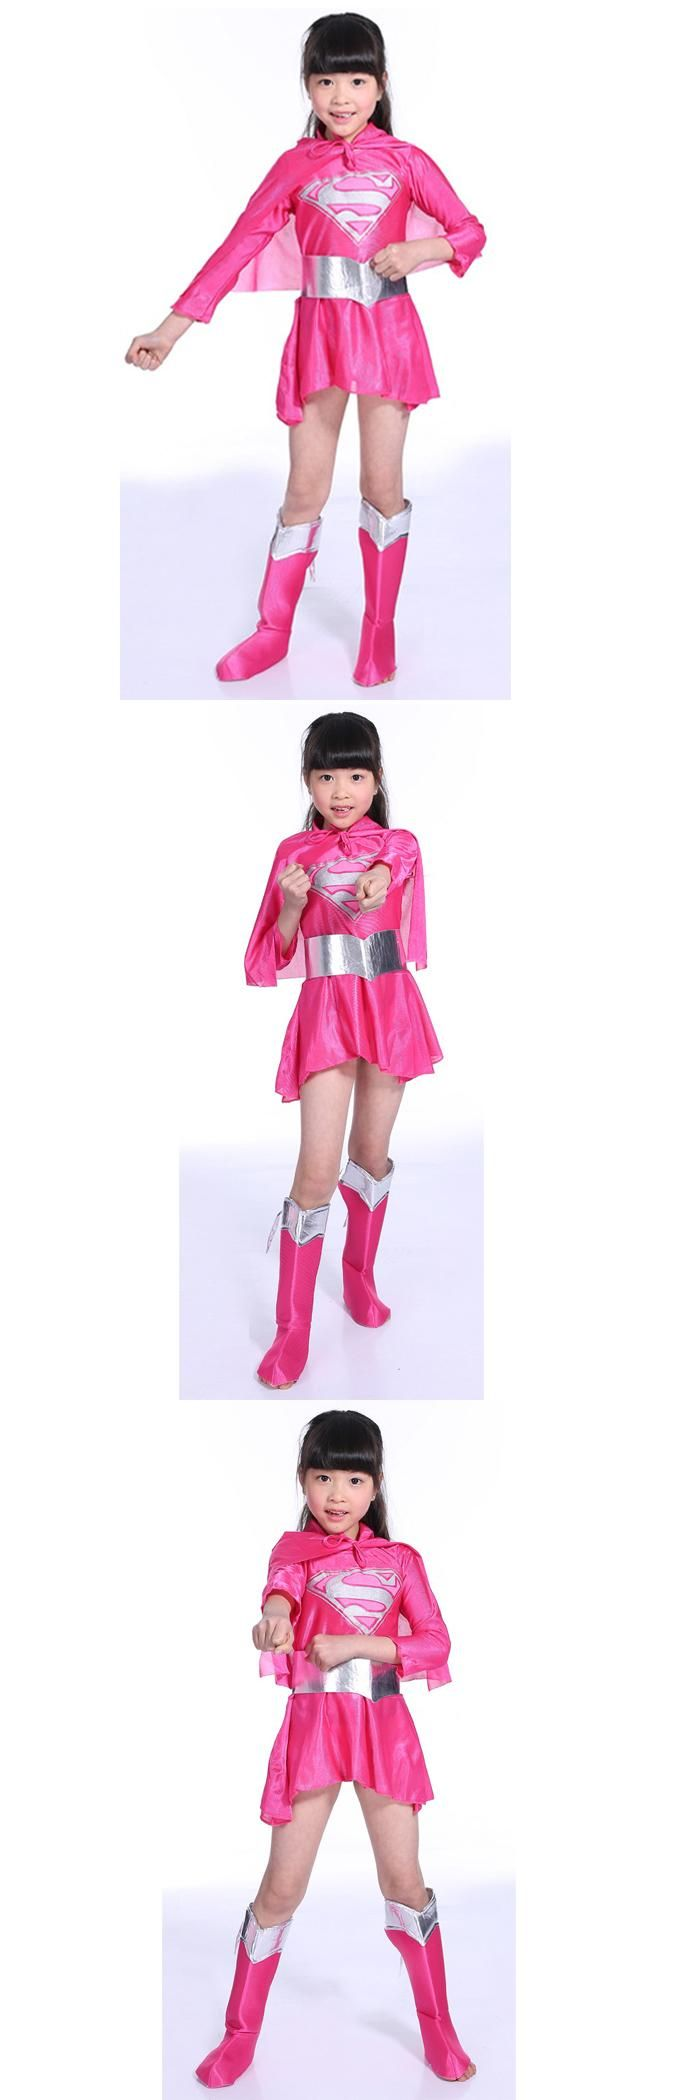 Pink Supergirl Superhero Hero Superman Fancy Dress Up Girl Kids Costume